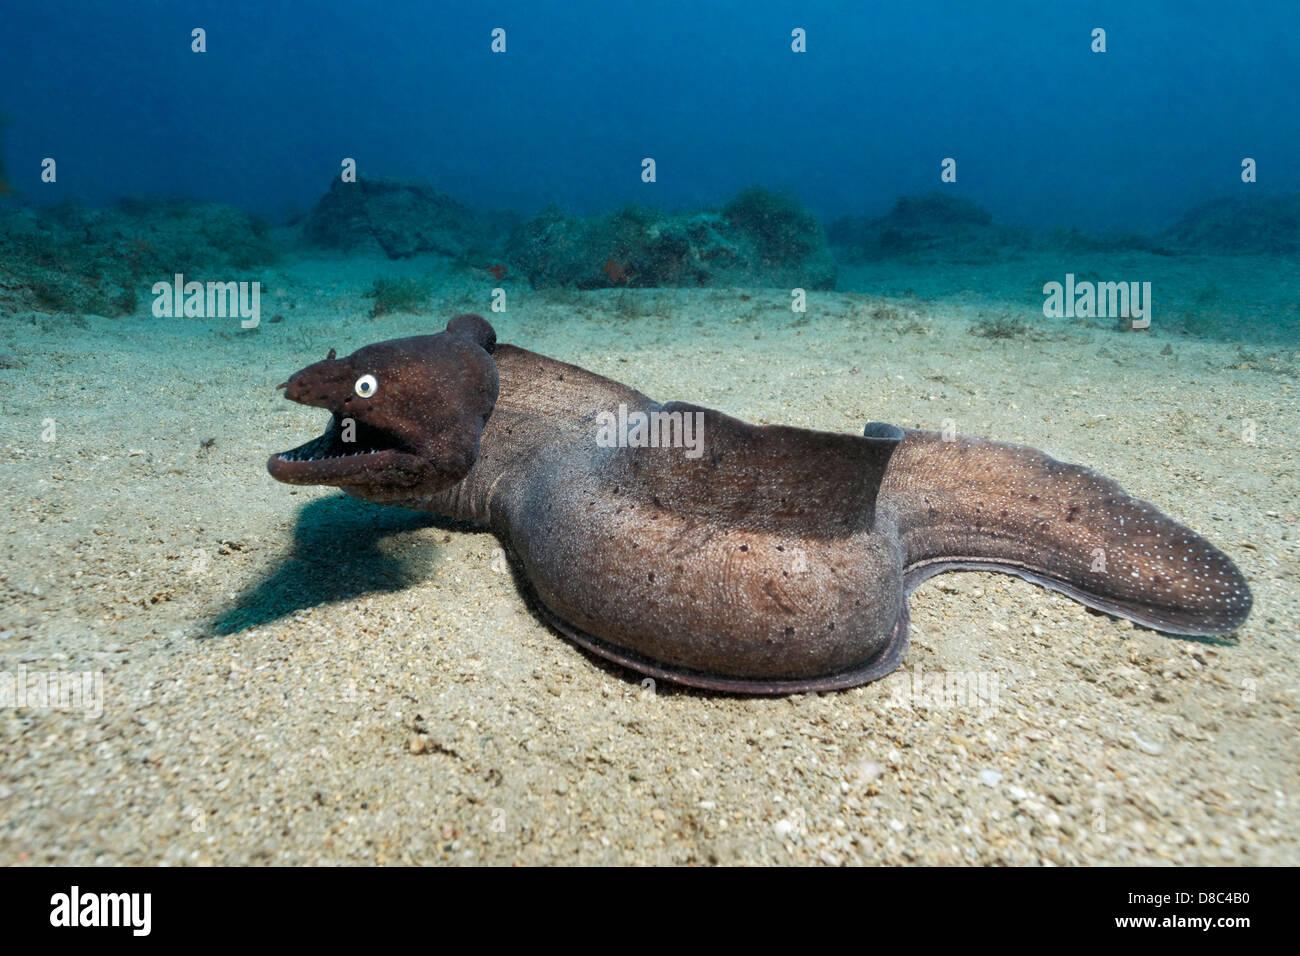 black moray eel stock photos u0026 black moray eel stock images alamy